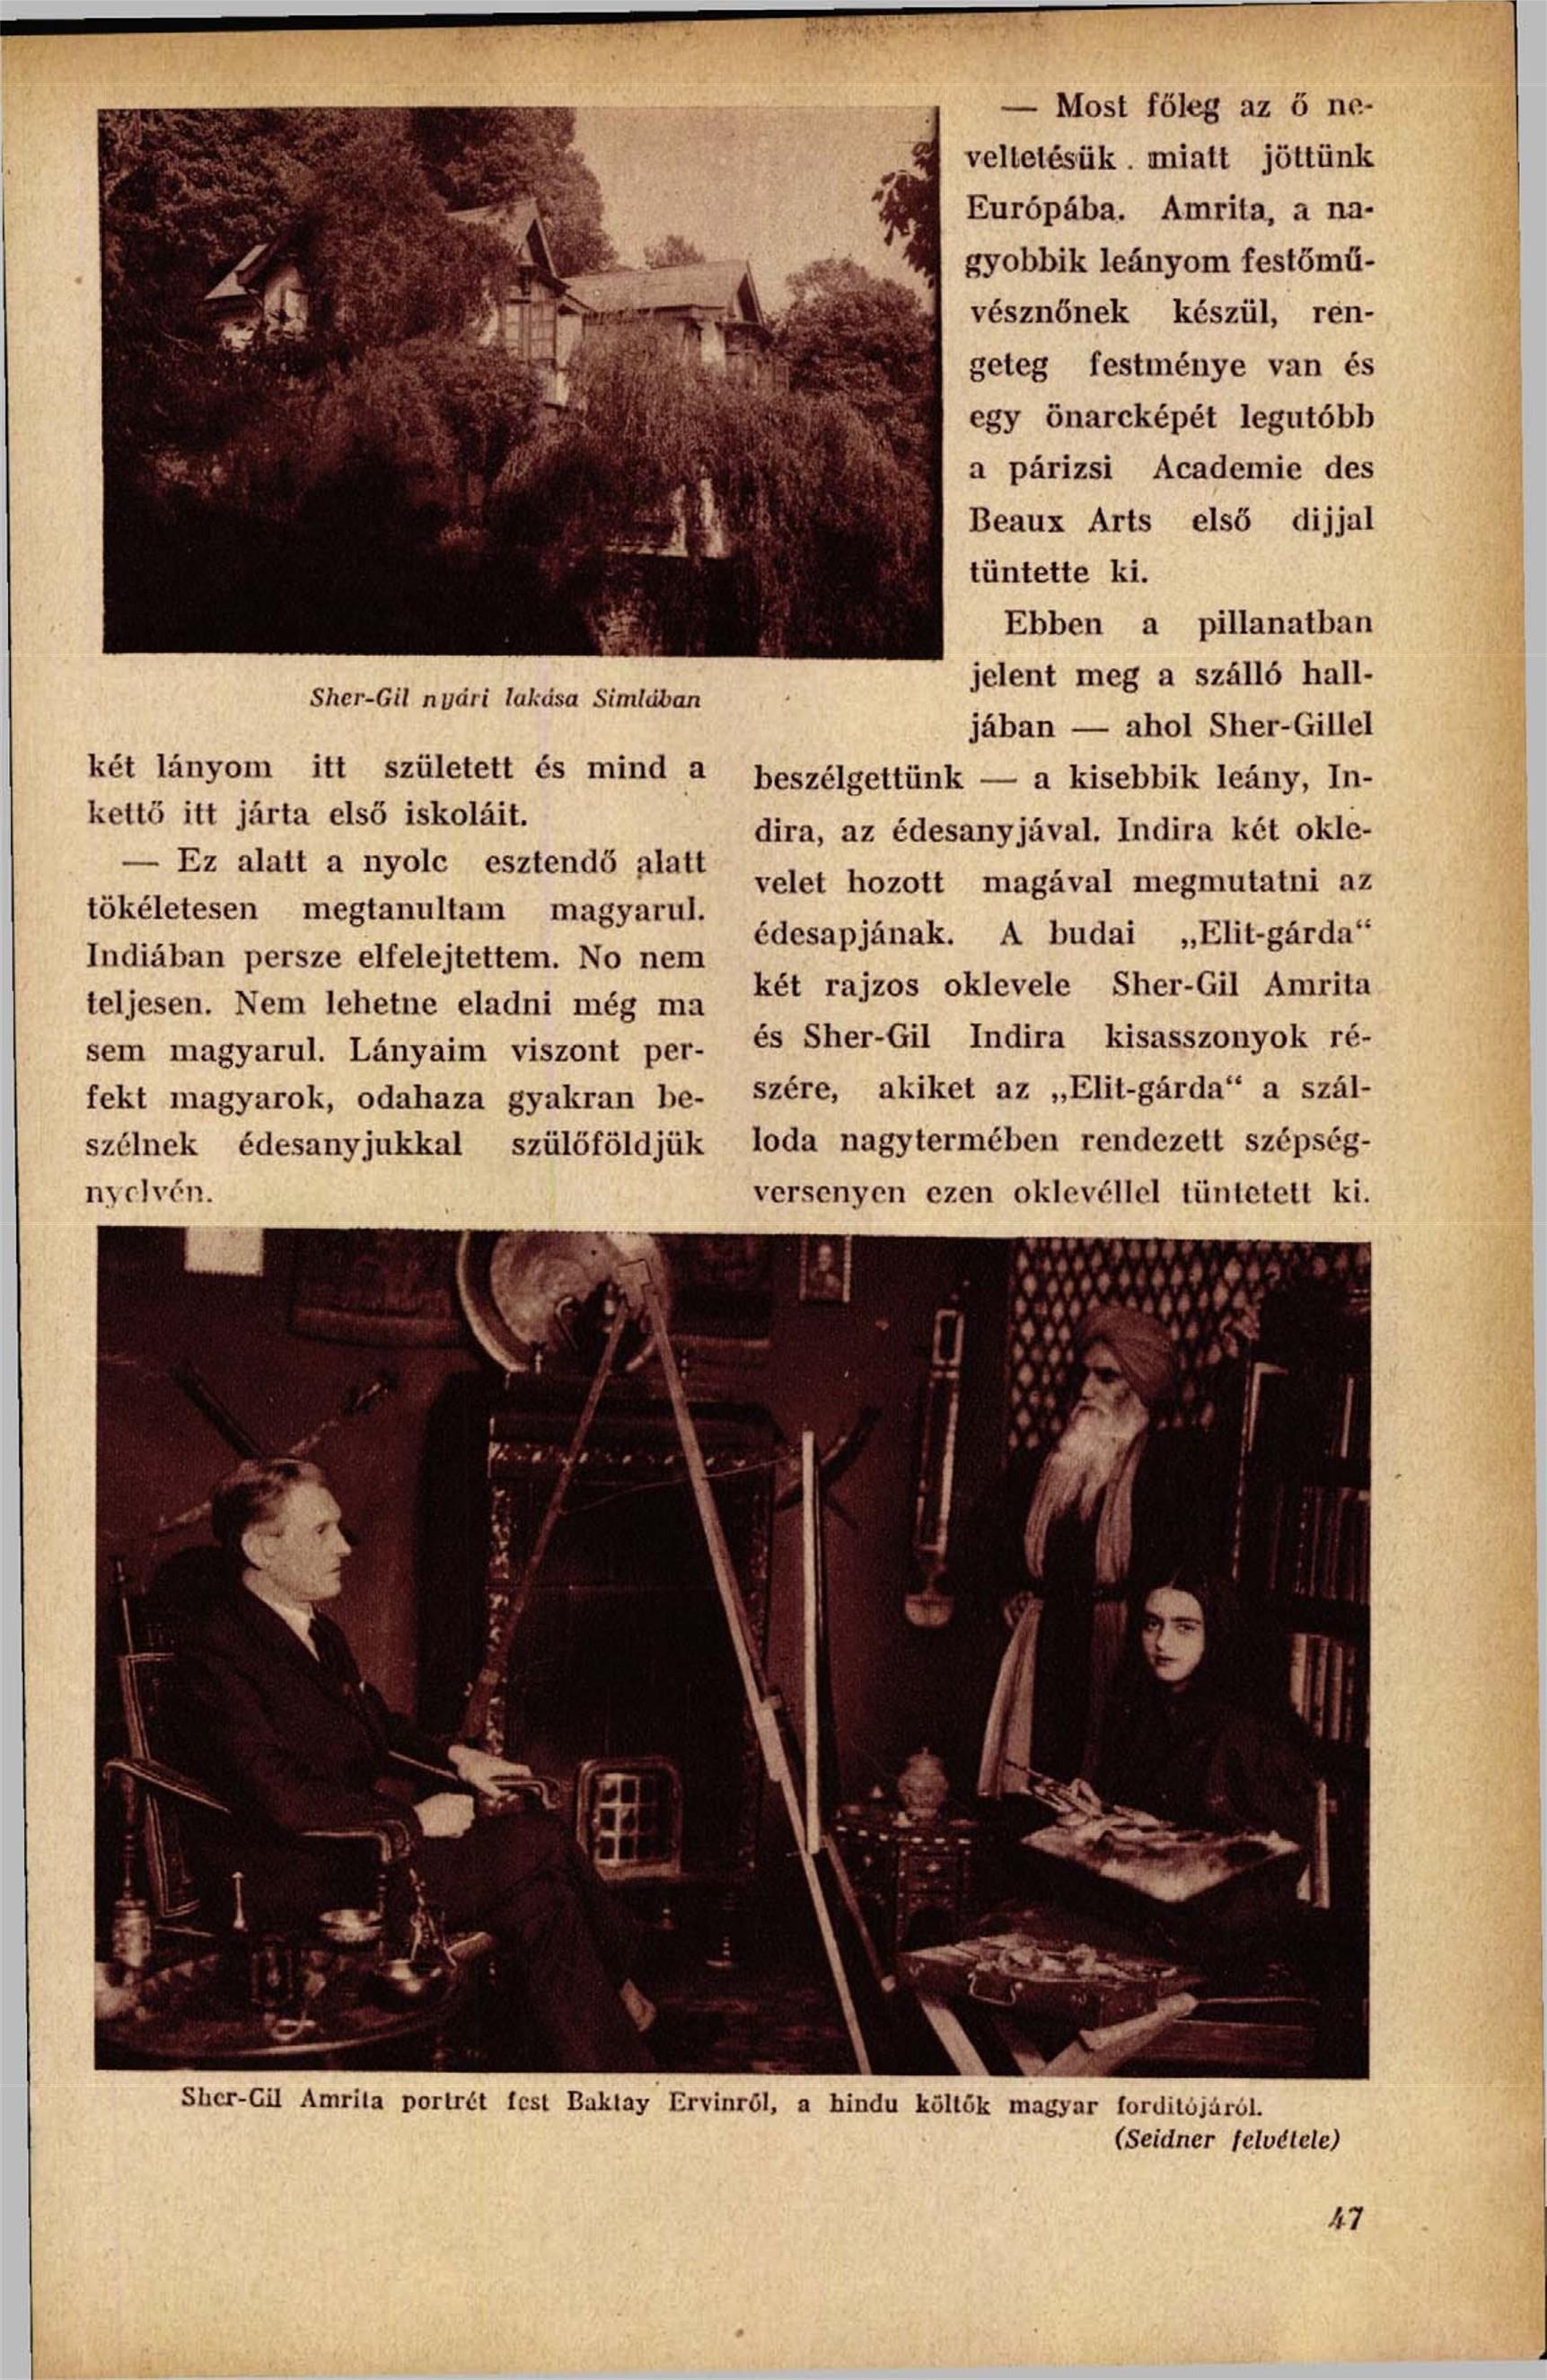 szinhazielet_1930_46_pages49-49.jpg